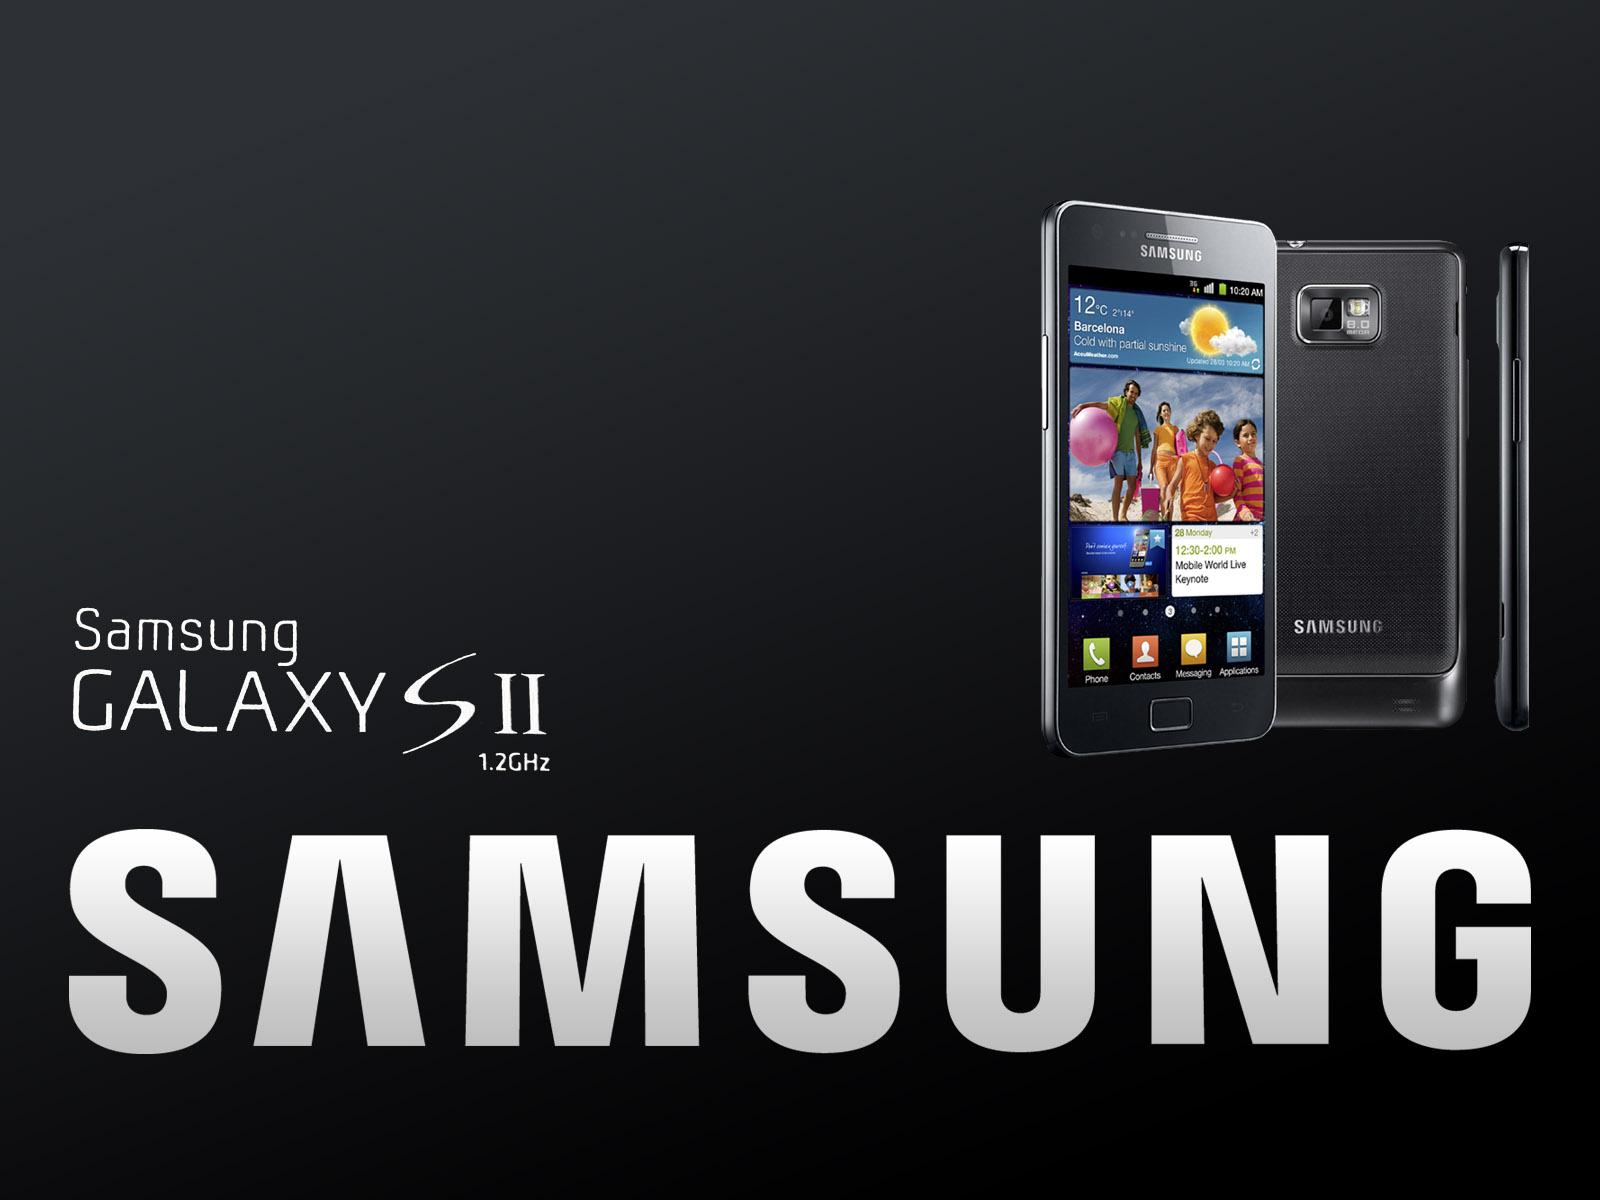 Samsung S2 Multiple Wallpaper Images: WTH Blog : Samsung Galaxy S 4G Galaxy S2 Wallpapers